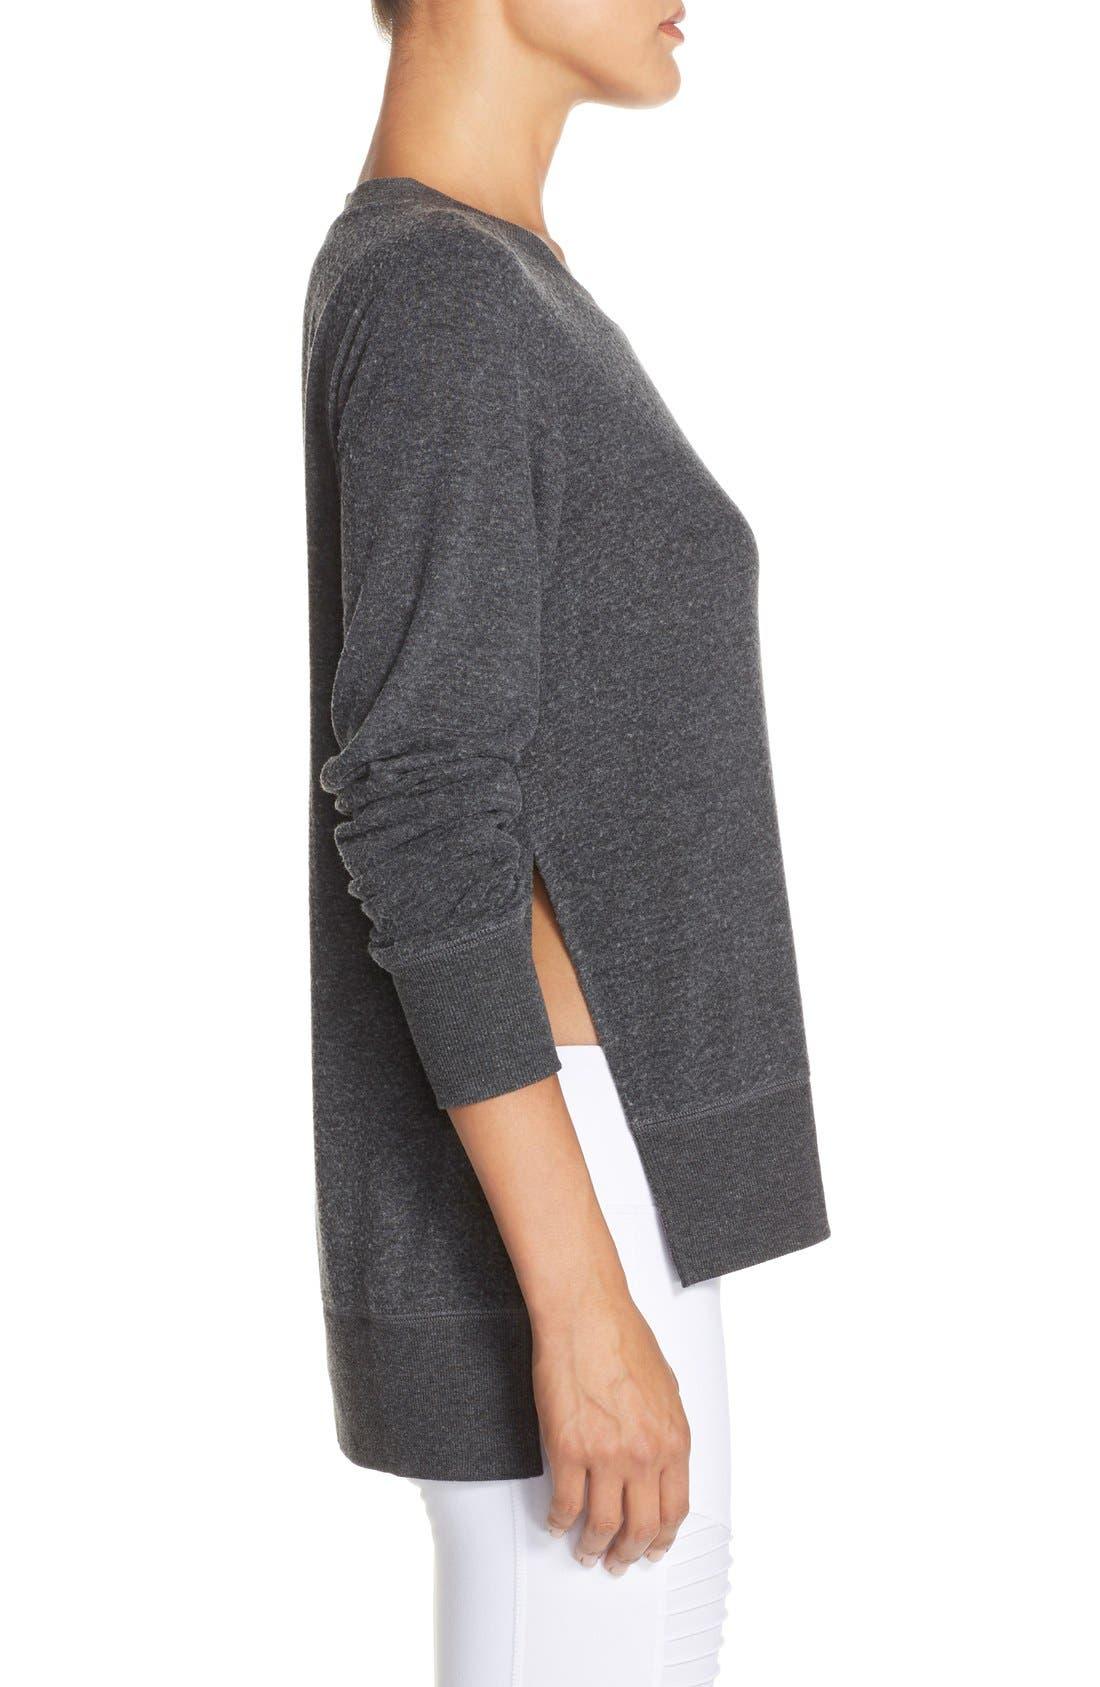 Alternate Image 3  - Alo 'Glimpse' Long Sleeve Top